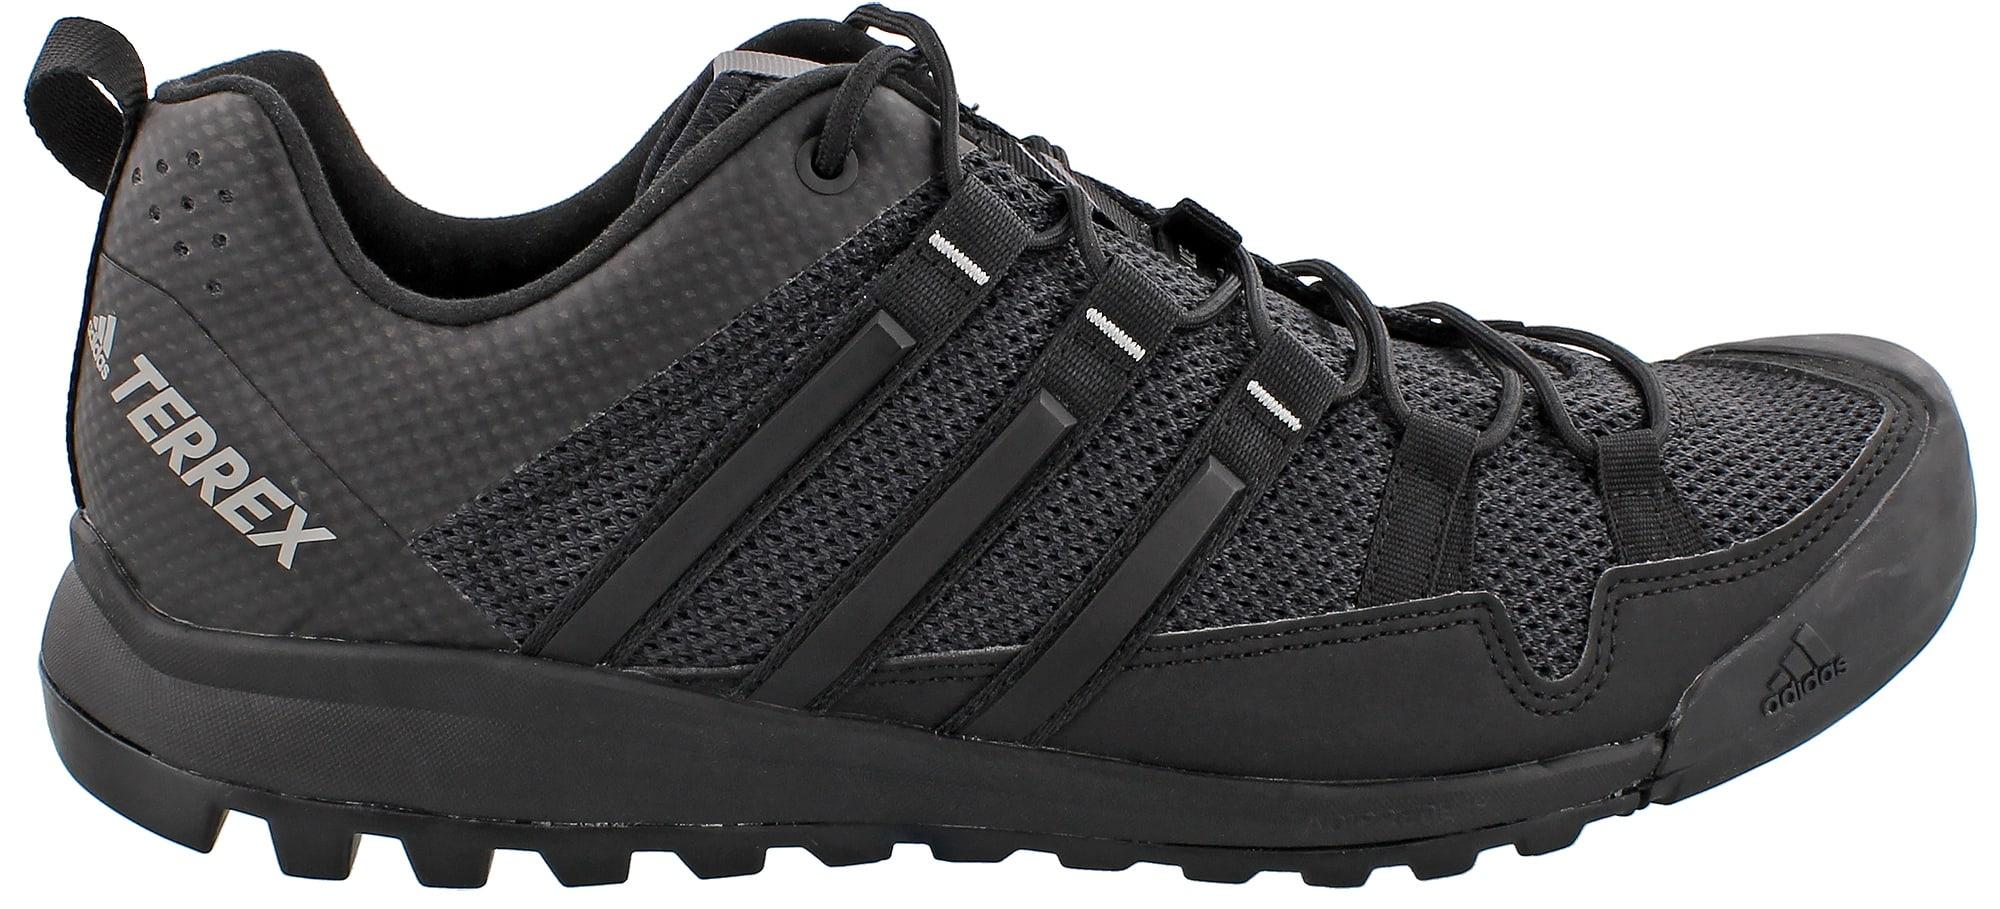 78339880deecf Adidas Terrex Solo Hiking Shoes - thumbnail 1